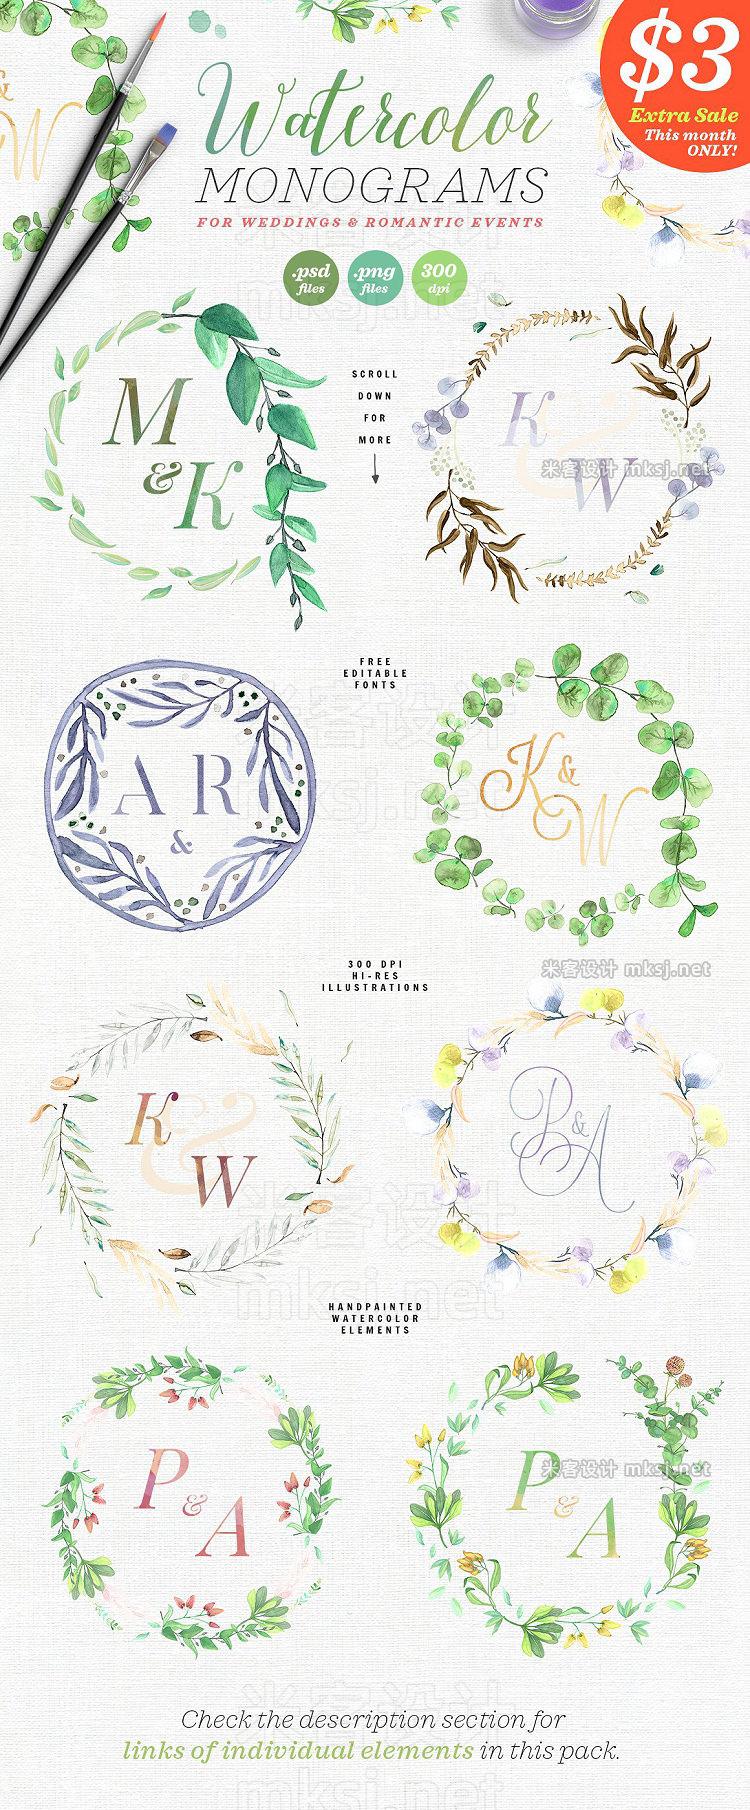 png素材 8 Watercolor Wedding Monograms I